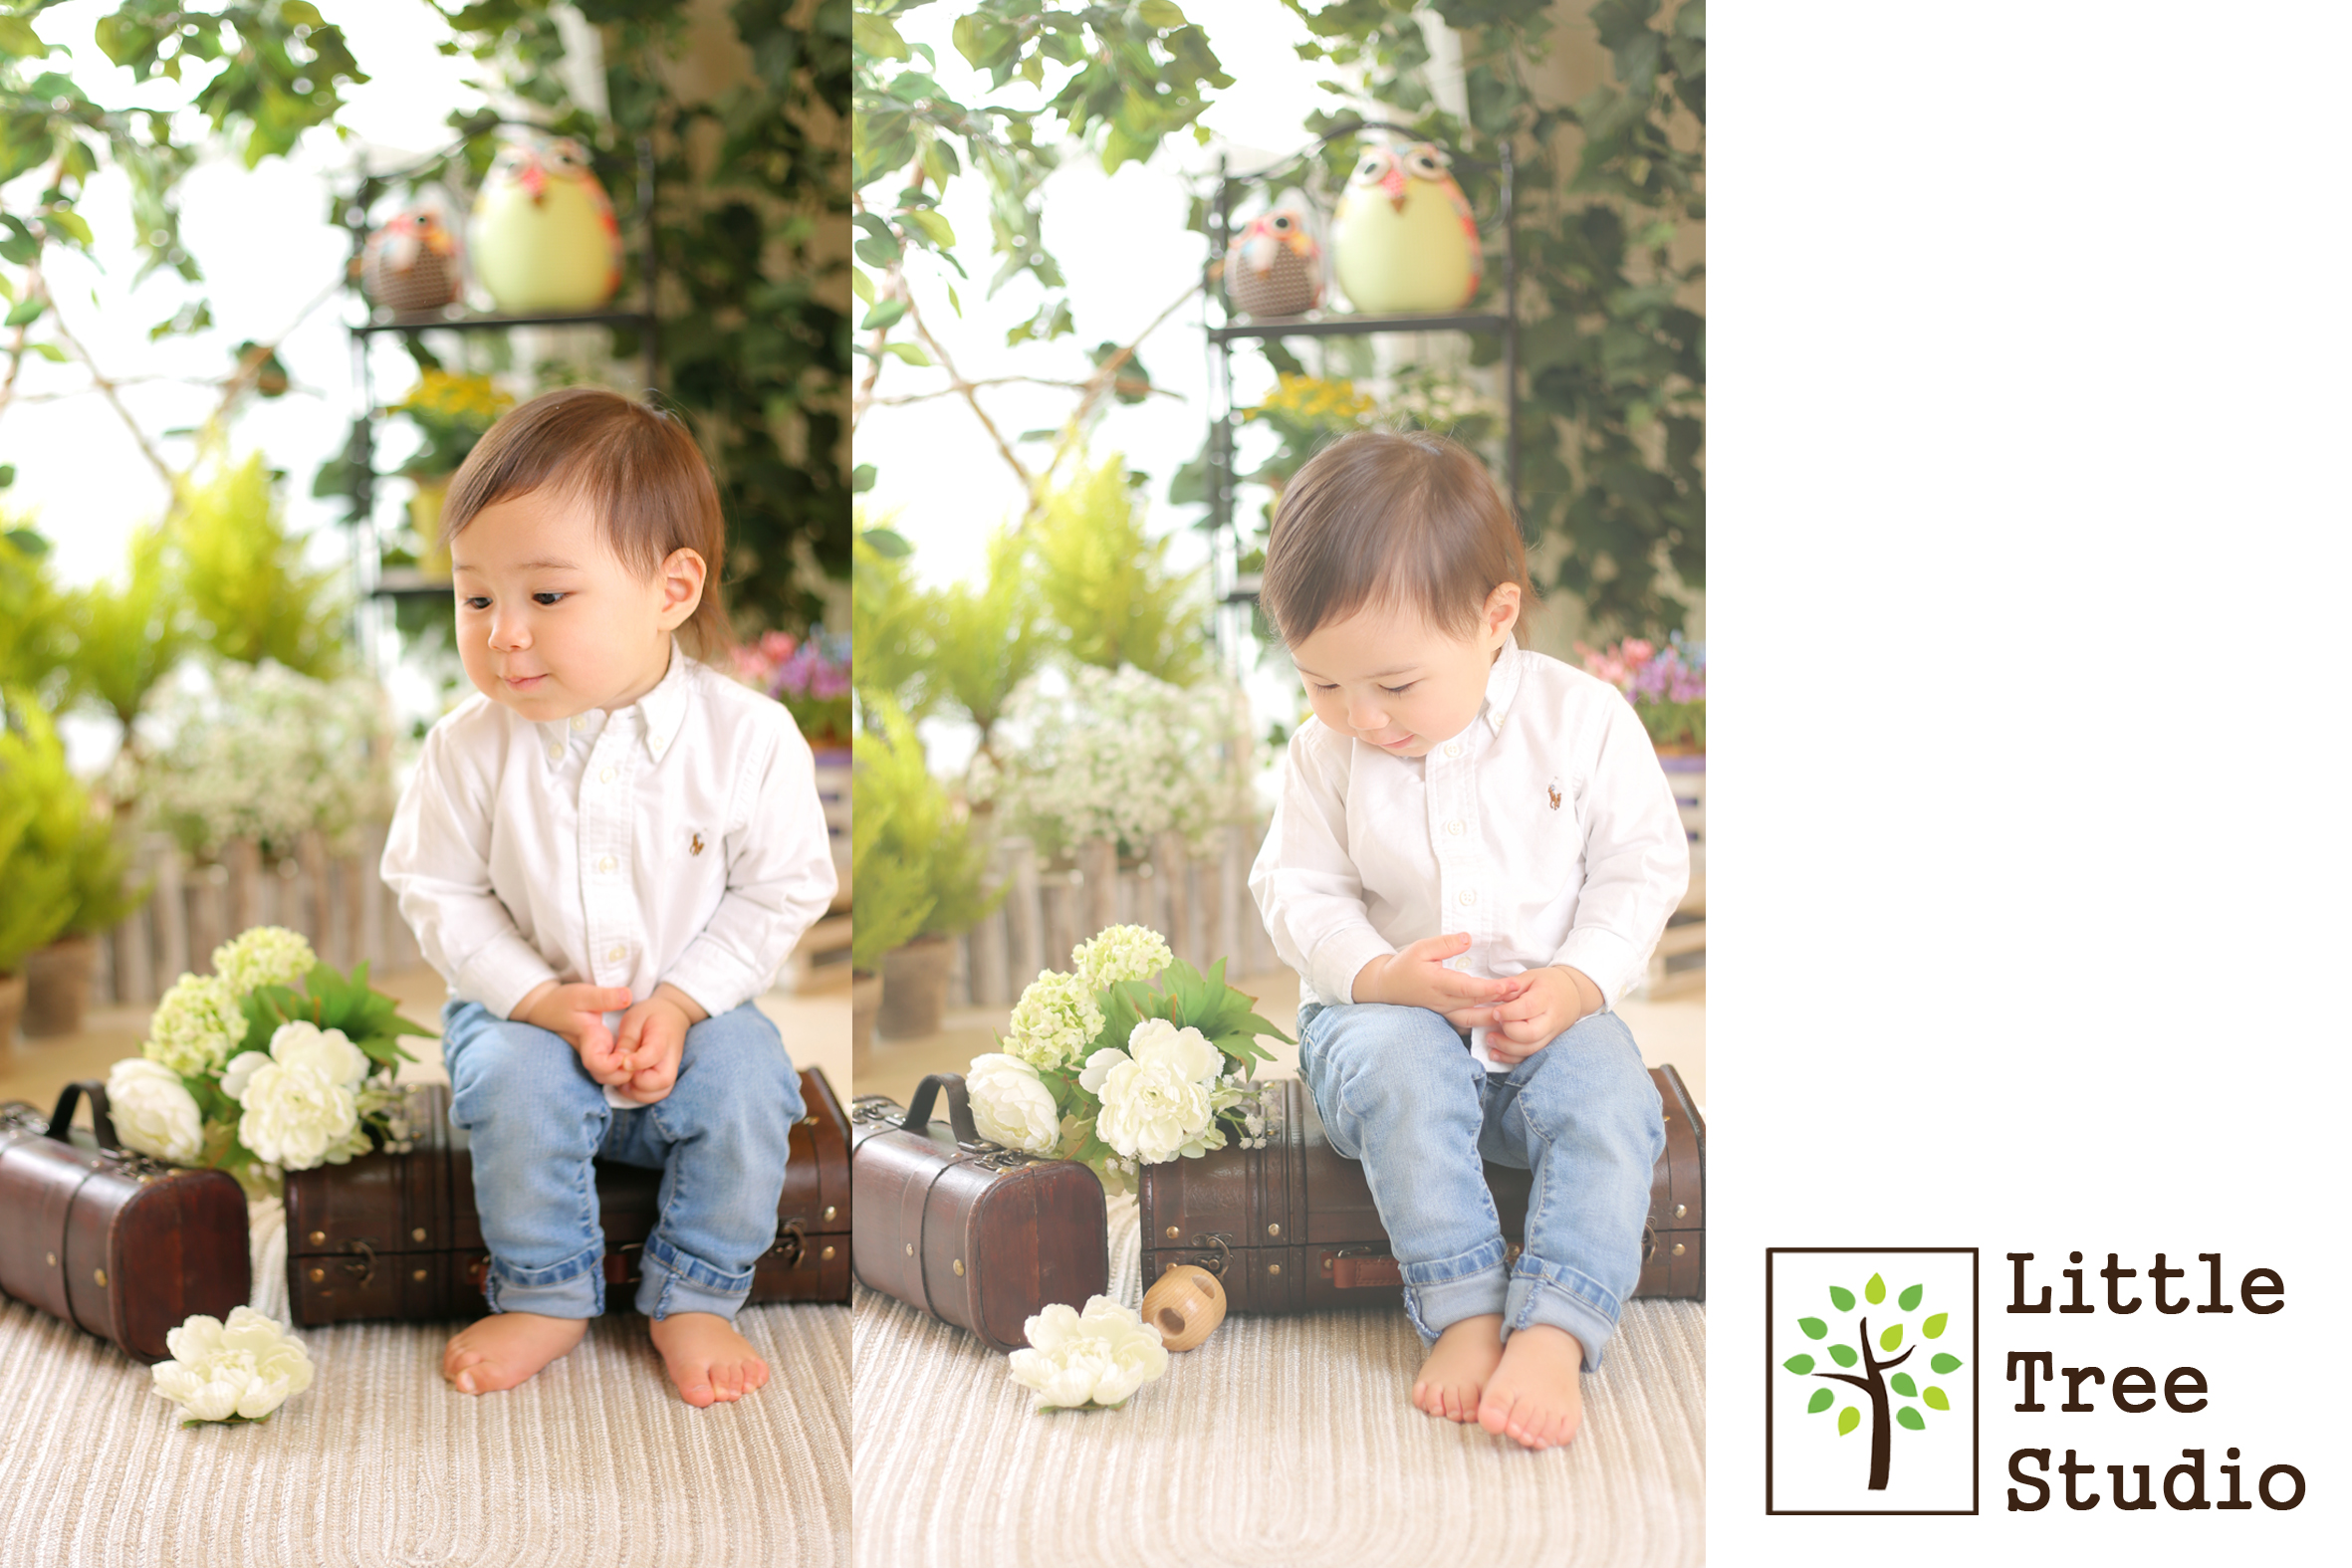 littletree baby146